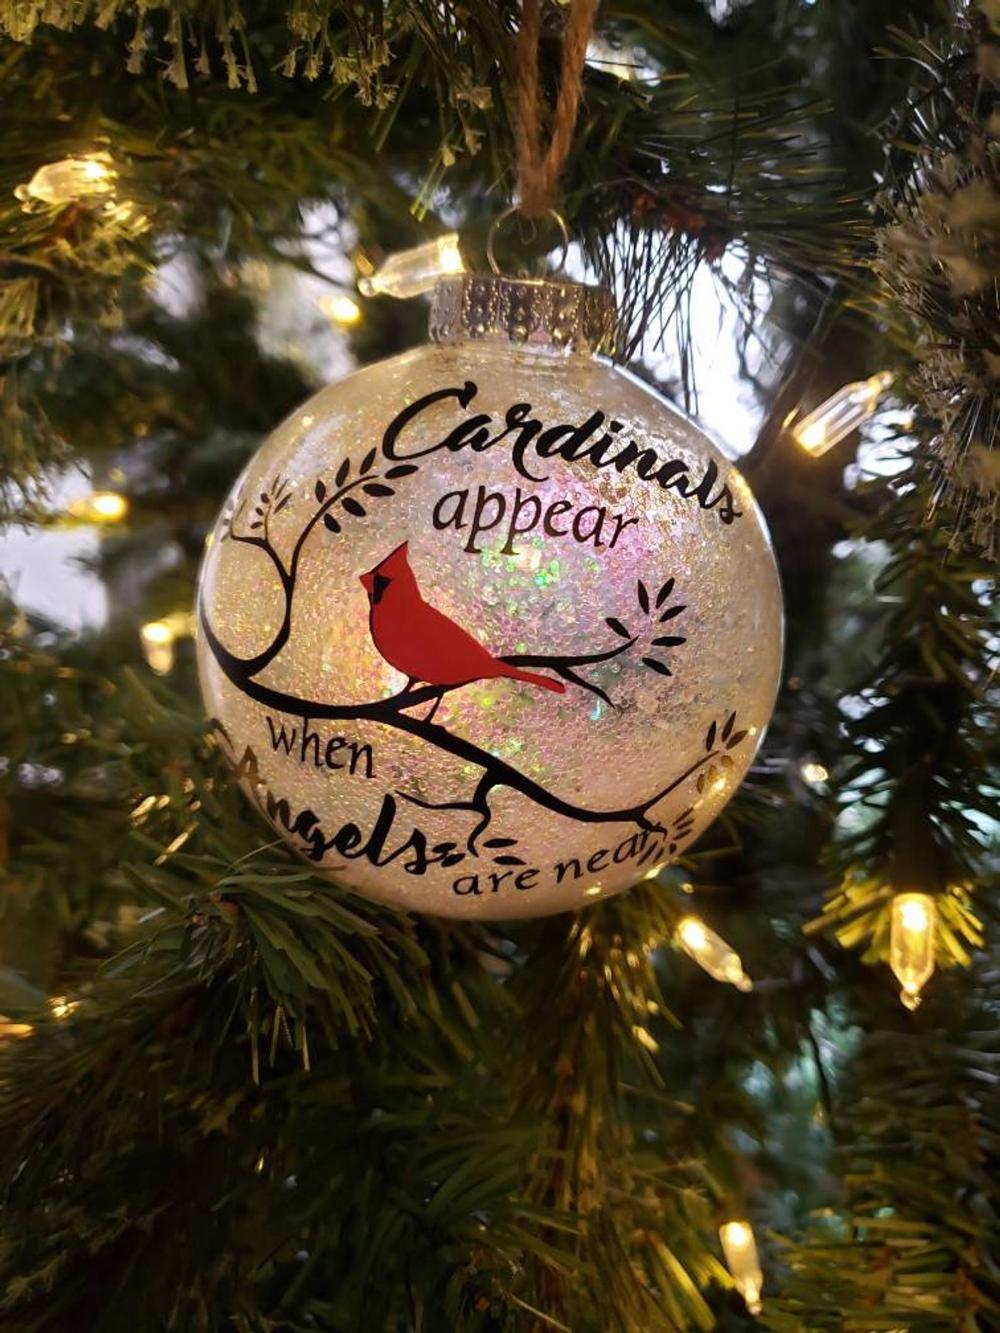 Christmas Cardinal Ornament Etsy In 2020 Cardinal Ornaments Christmas Cardinals Ornaments